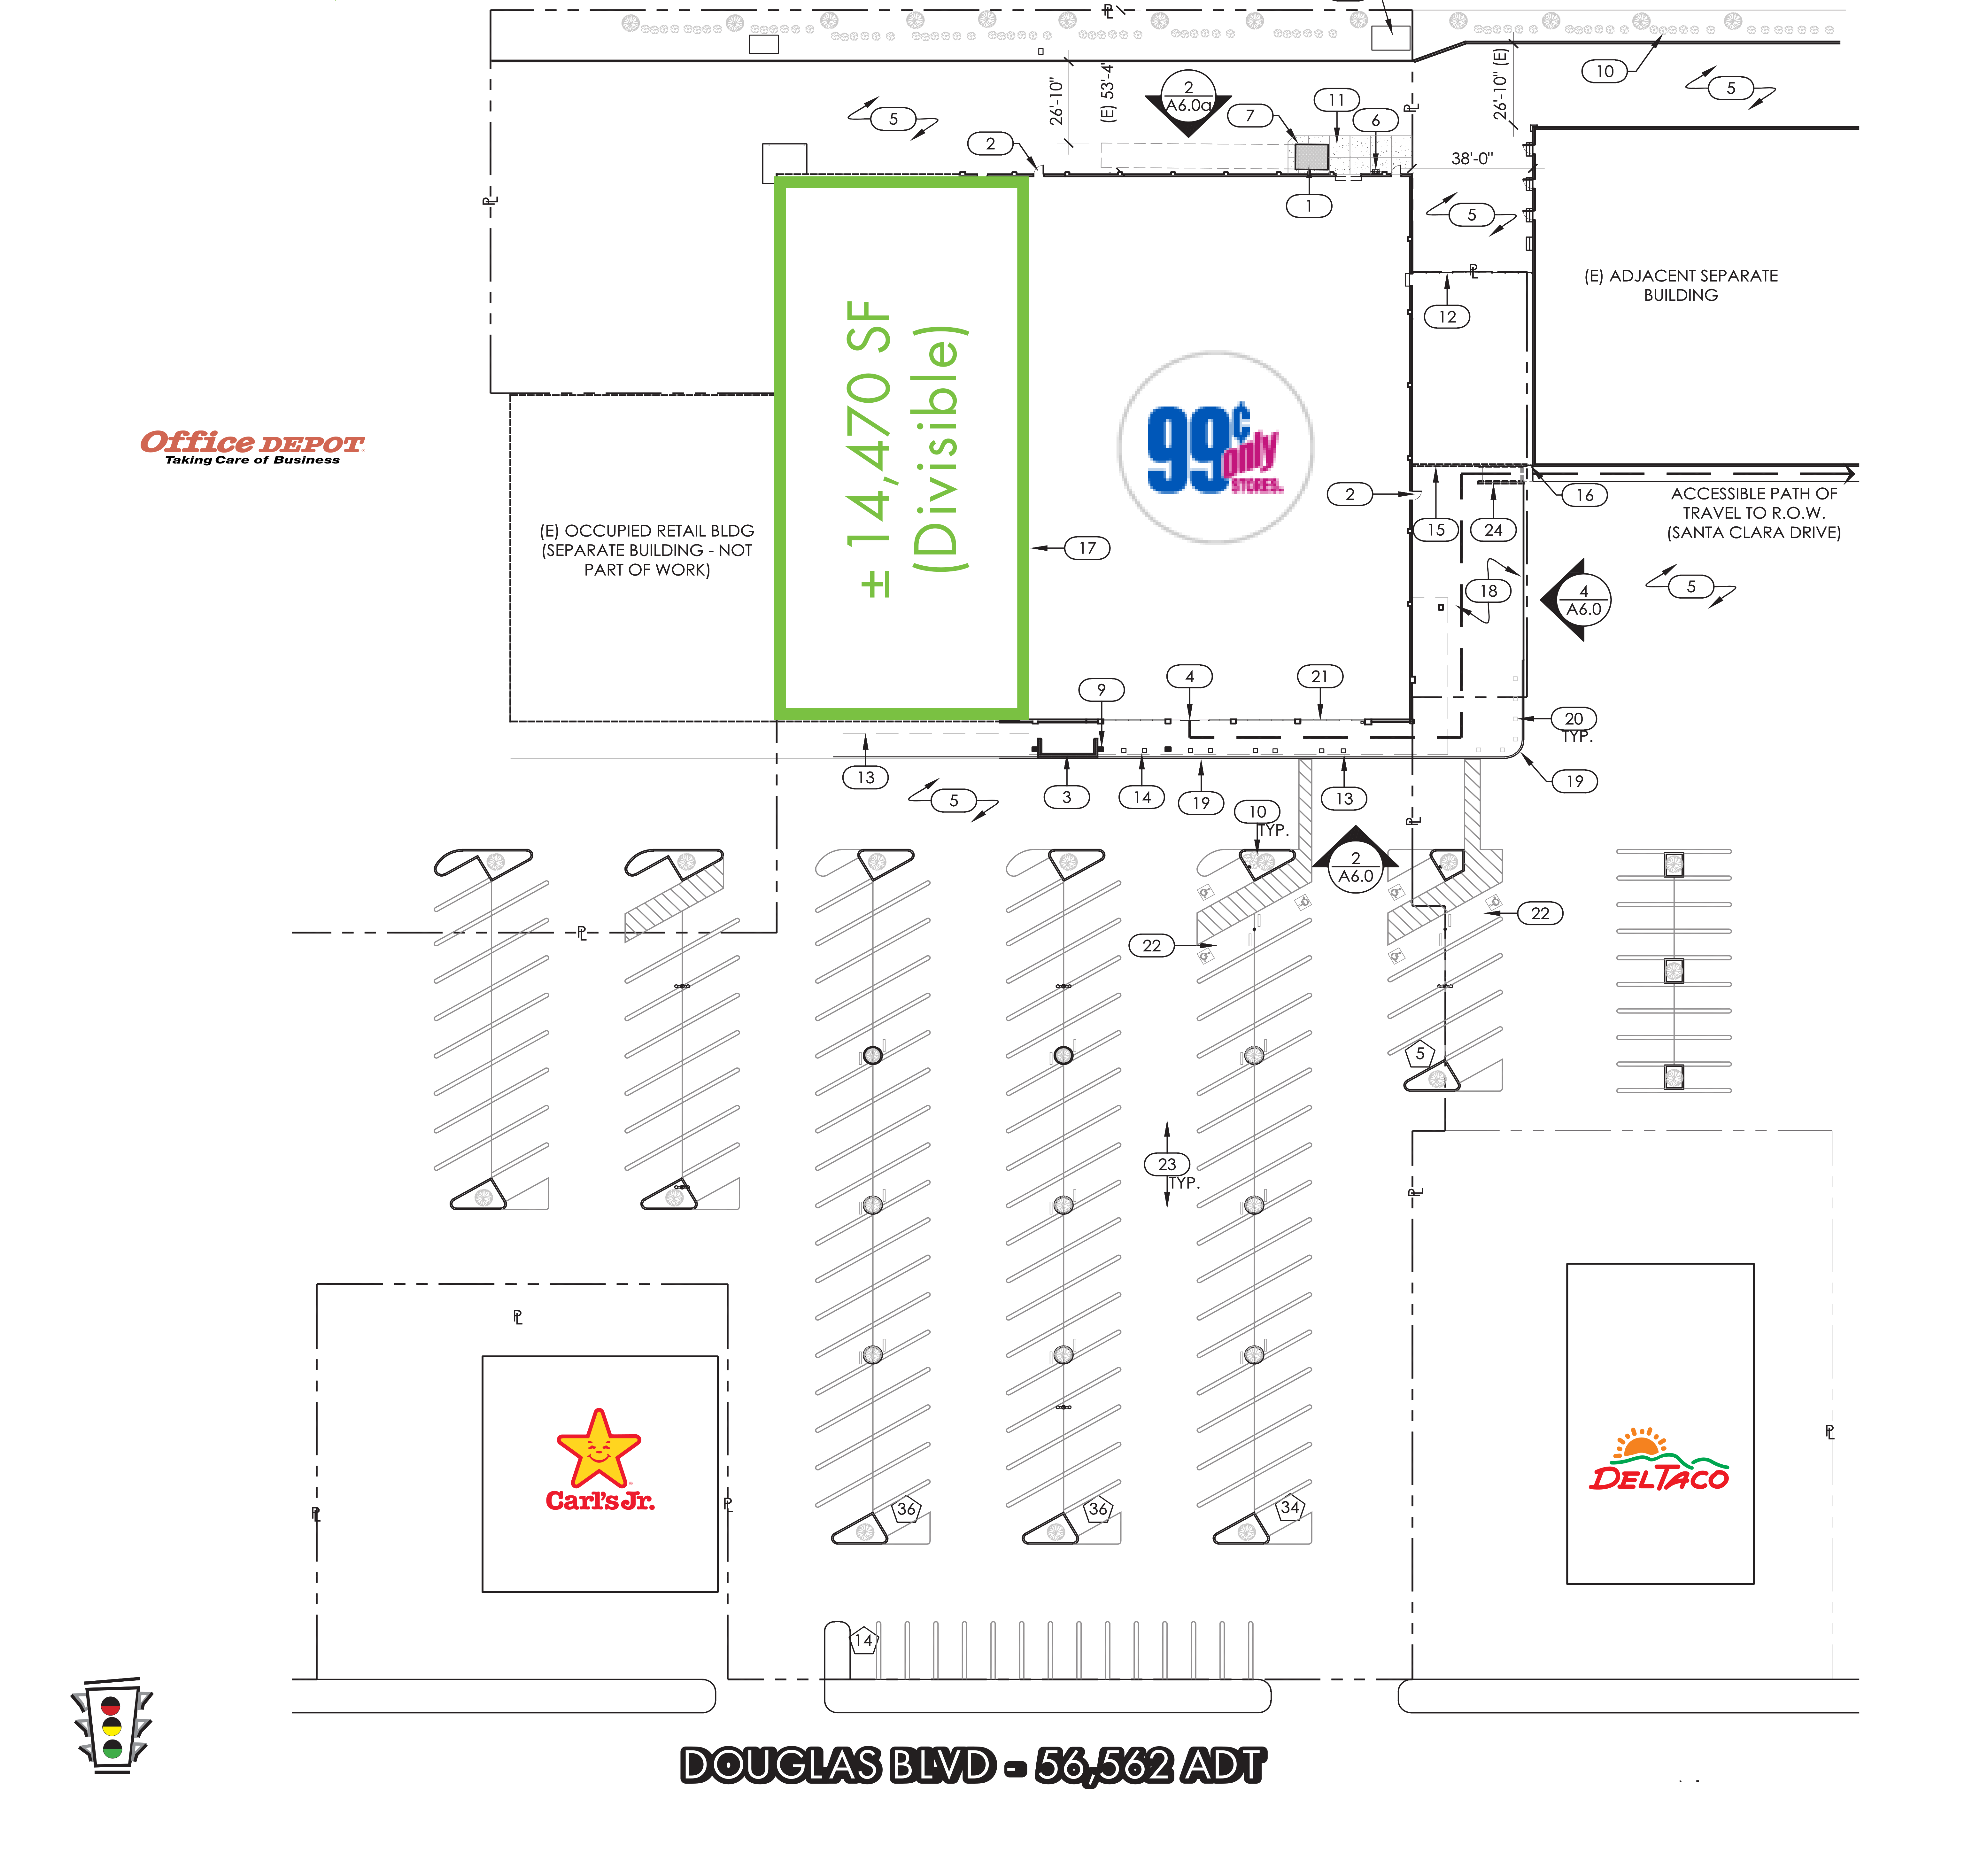 Douglas Plaza Junior Anchor: site plan